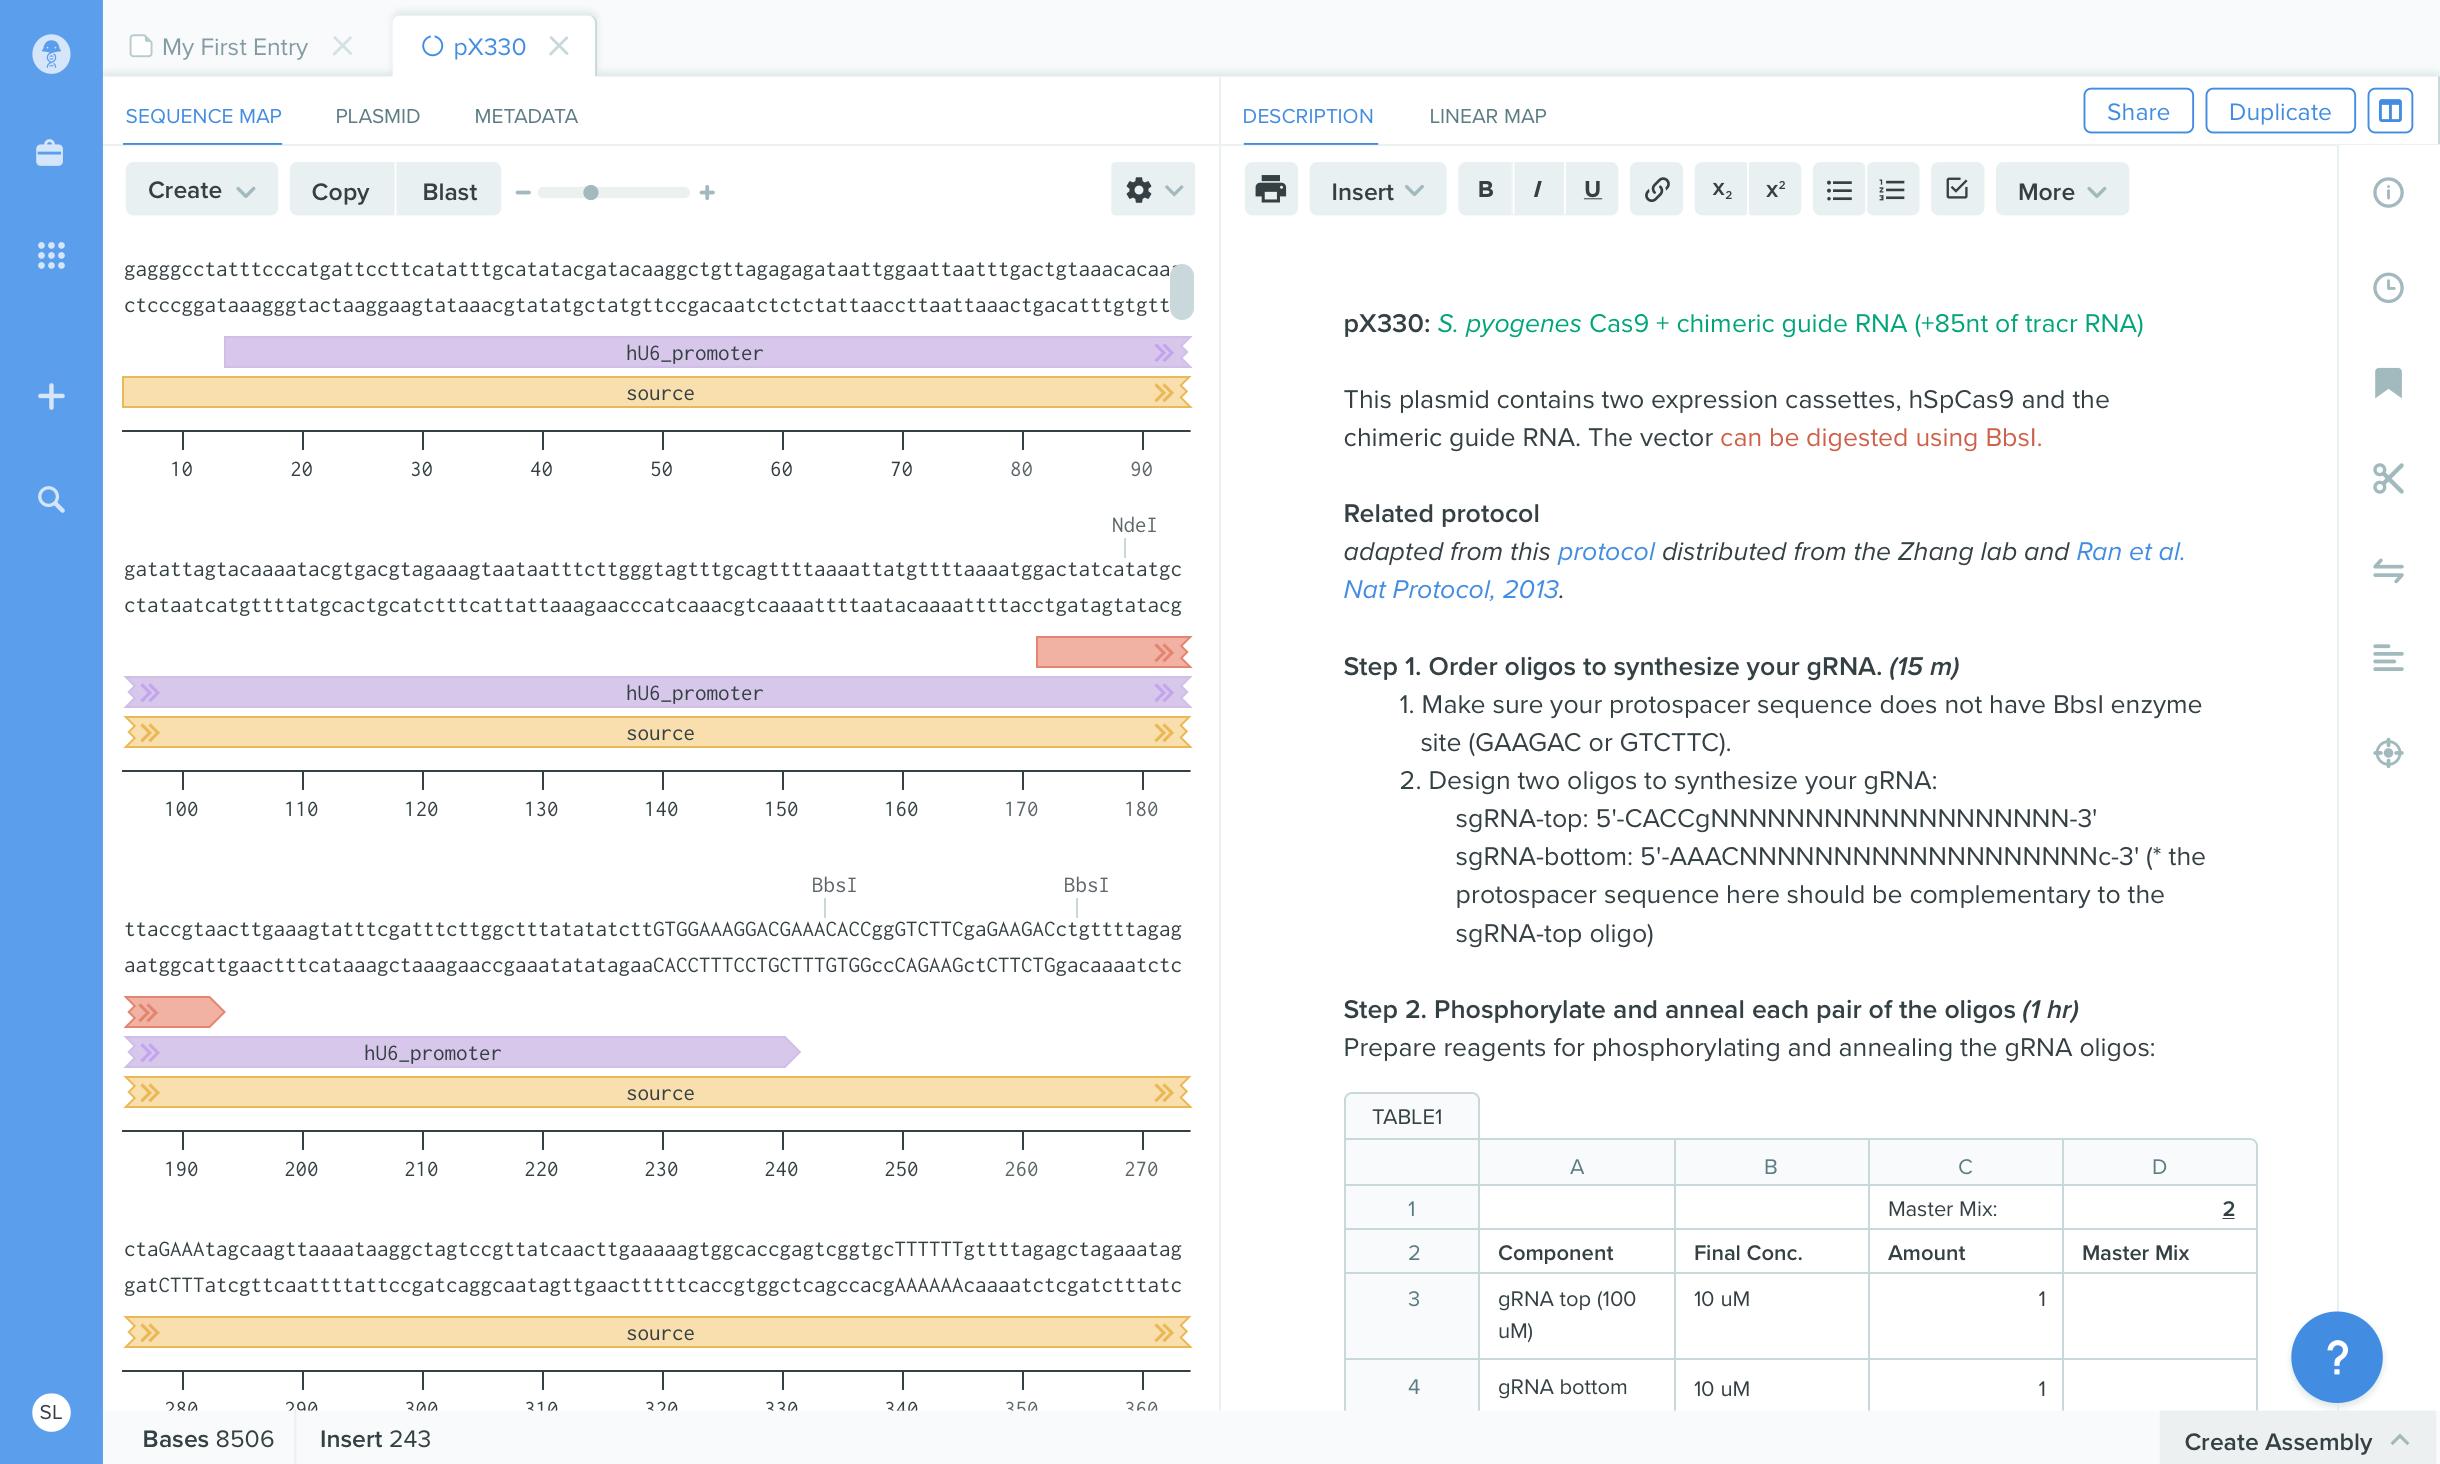 benchling-product-screenshot